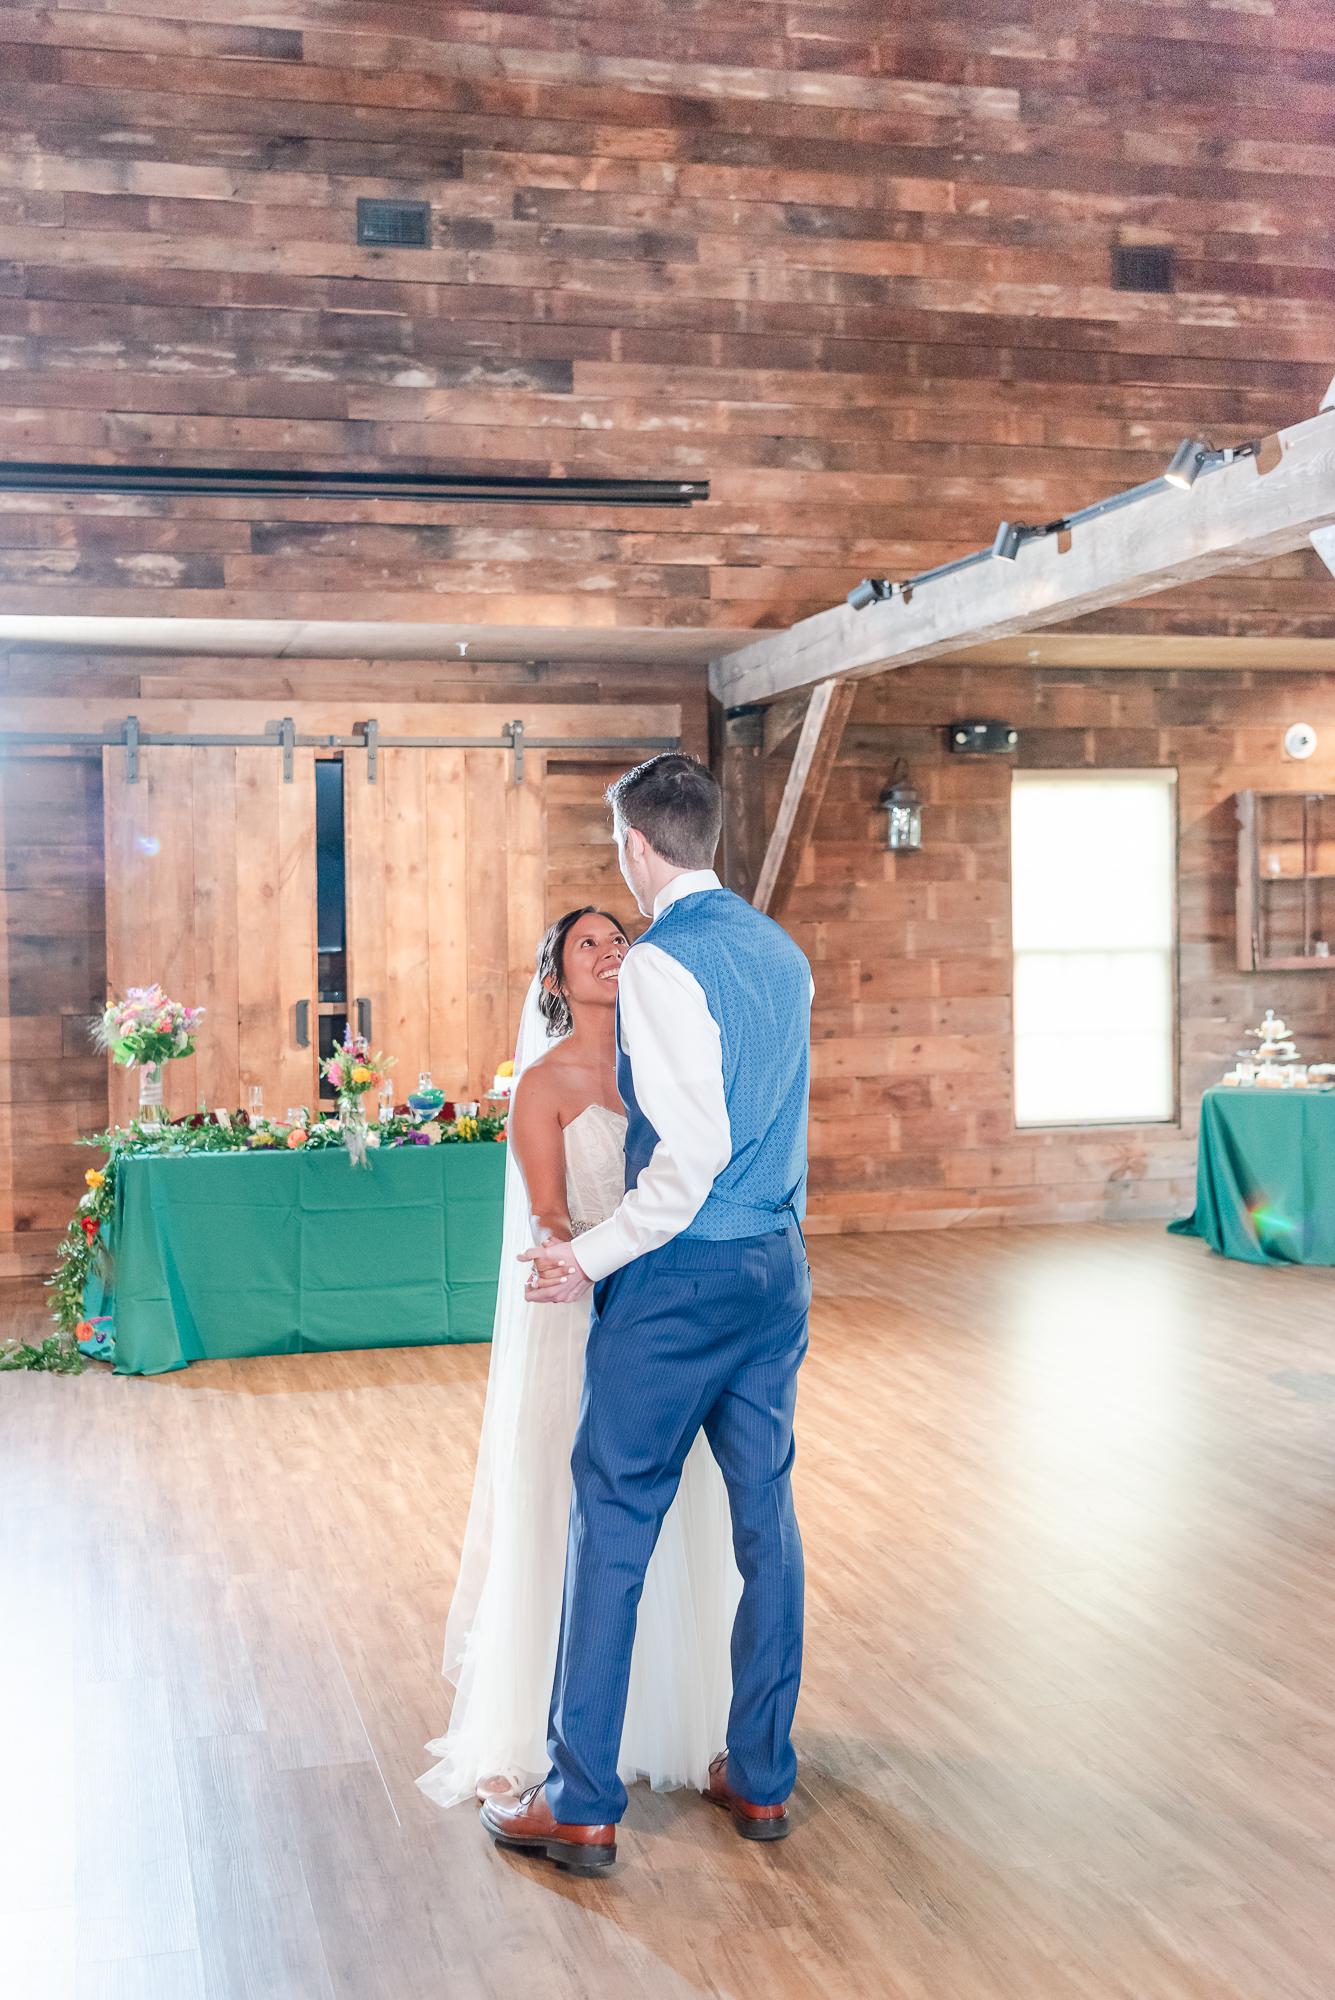 Maria+Adam_Summer Barn Wedding_The Barn at The North Star Preserve_Oberlin_Ohio-190.jpg